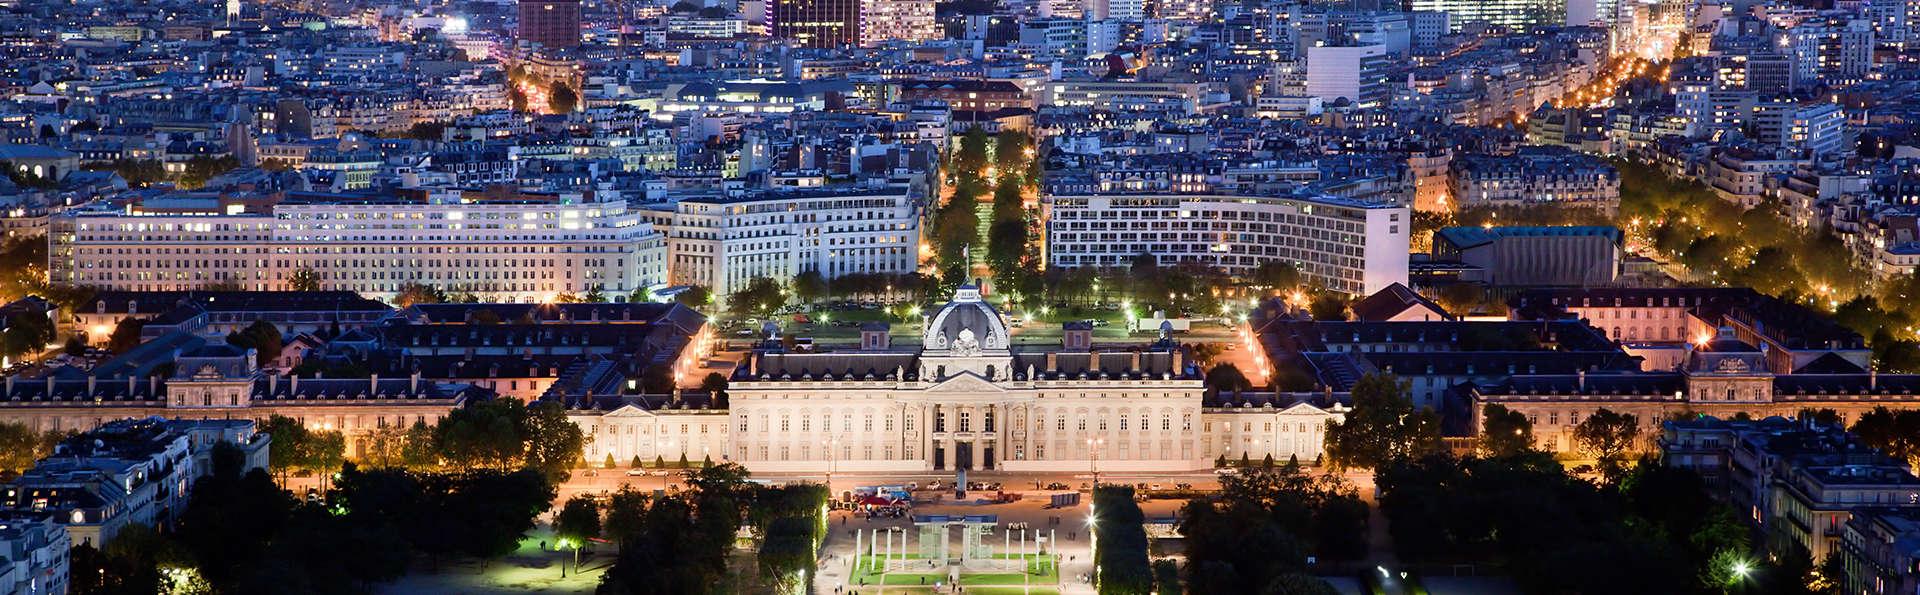 Hotel - Restaurant Le Vert Galant - Edit_Paris27.jpg